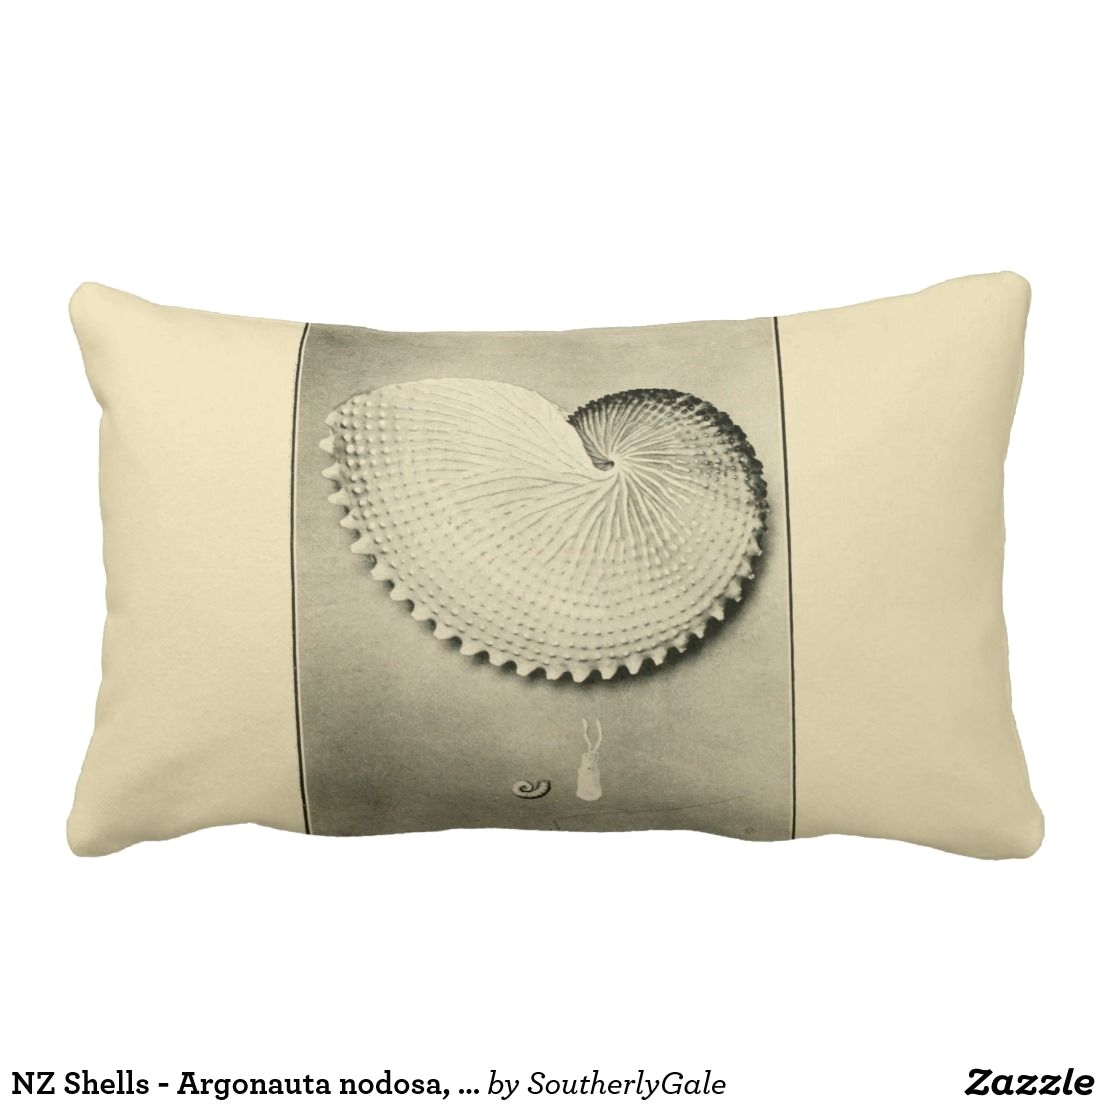 Best Place to Buy Decorative Bed Pillows Nz Shells Argonauta Nodosa Dolium Variegatum Lumbar Pillow A